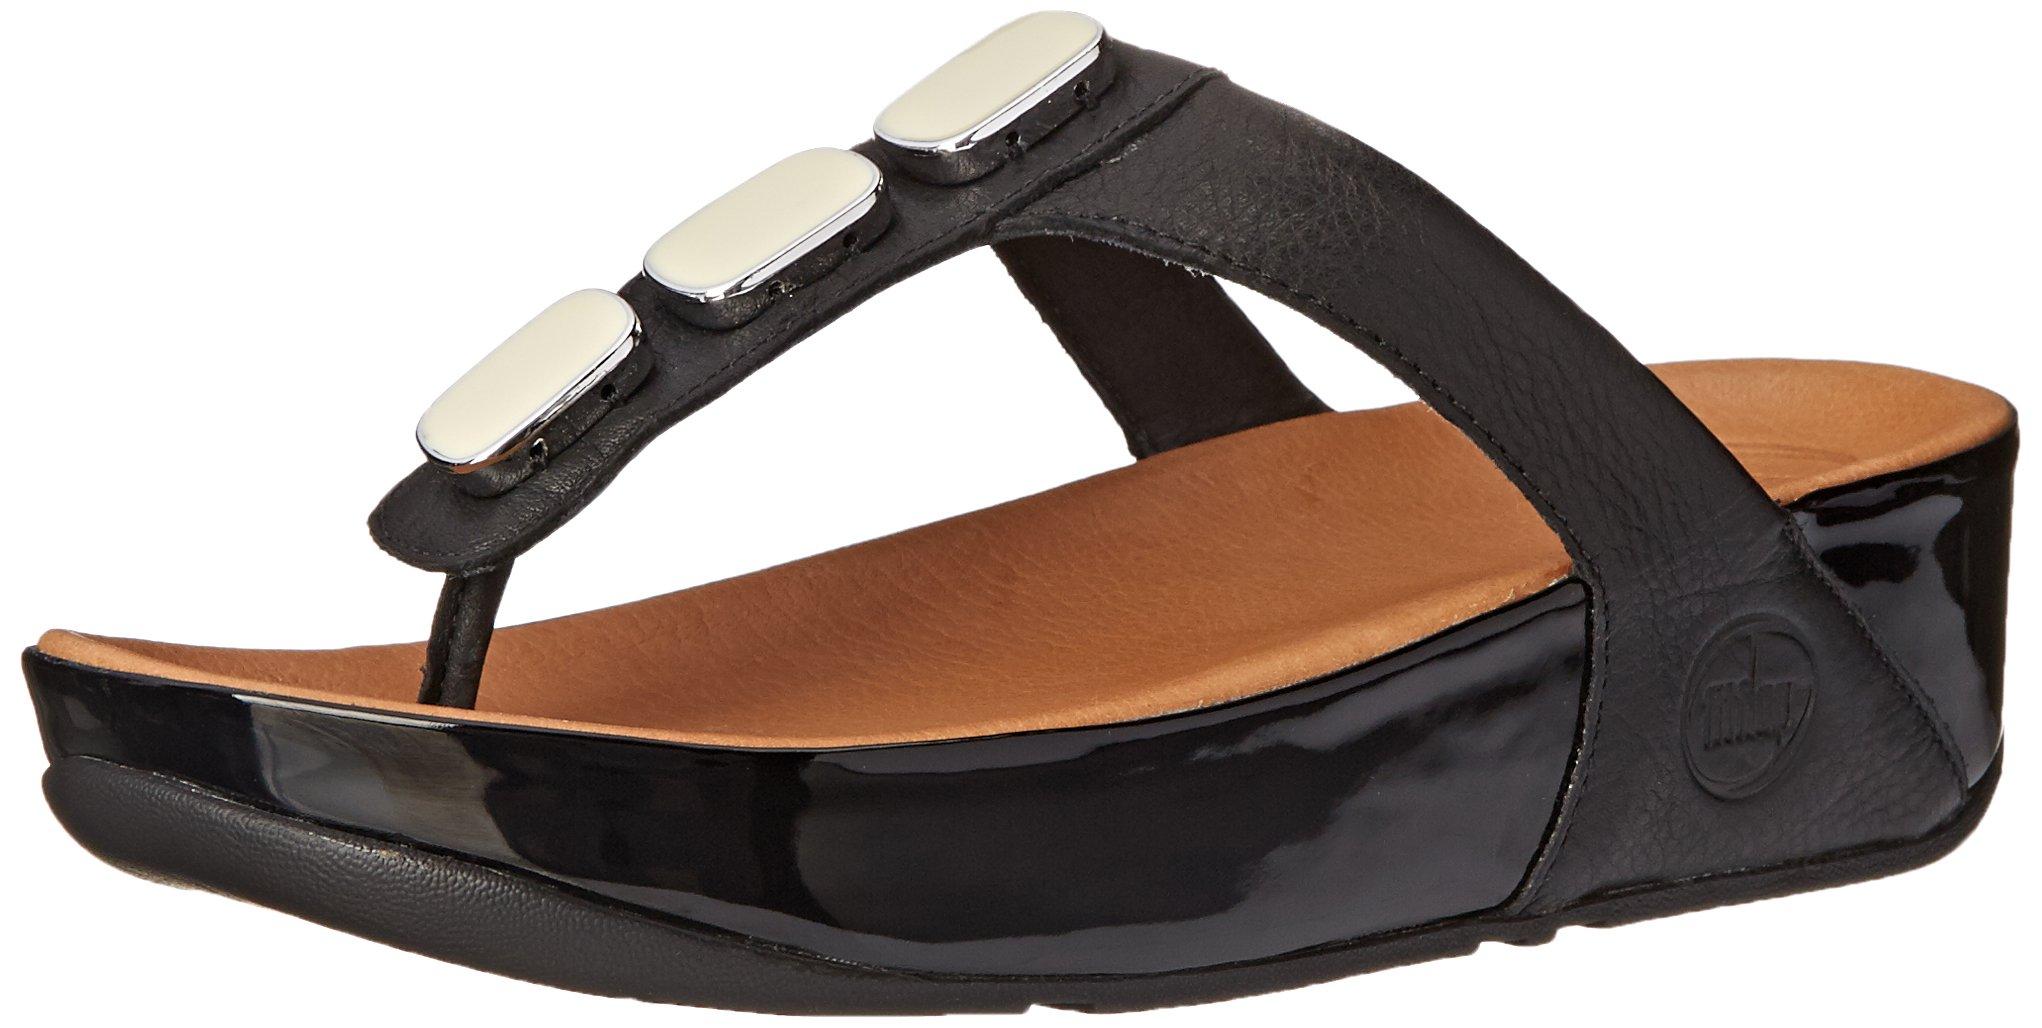 FitFlop Women's Pietra 11 Flip Flop, Black, 9 M US